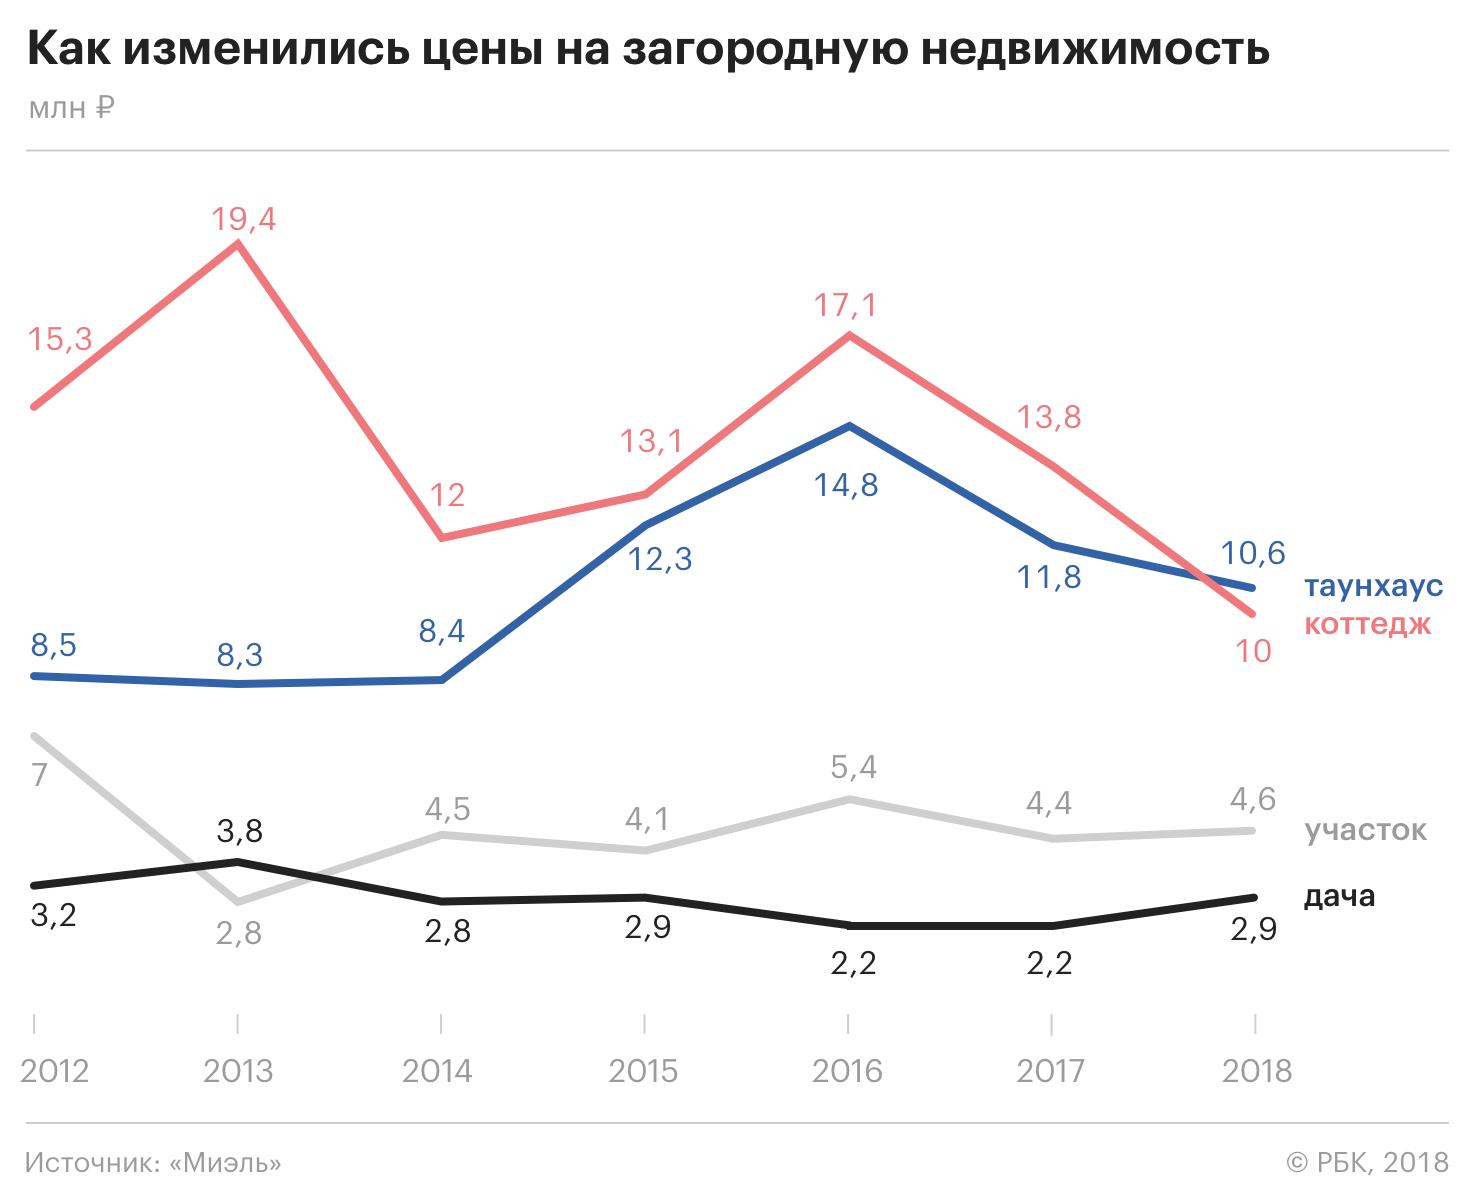 https://s0.rbk.ru/v6_top_pics/media/img/9/26/755371646795269.png